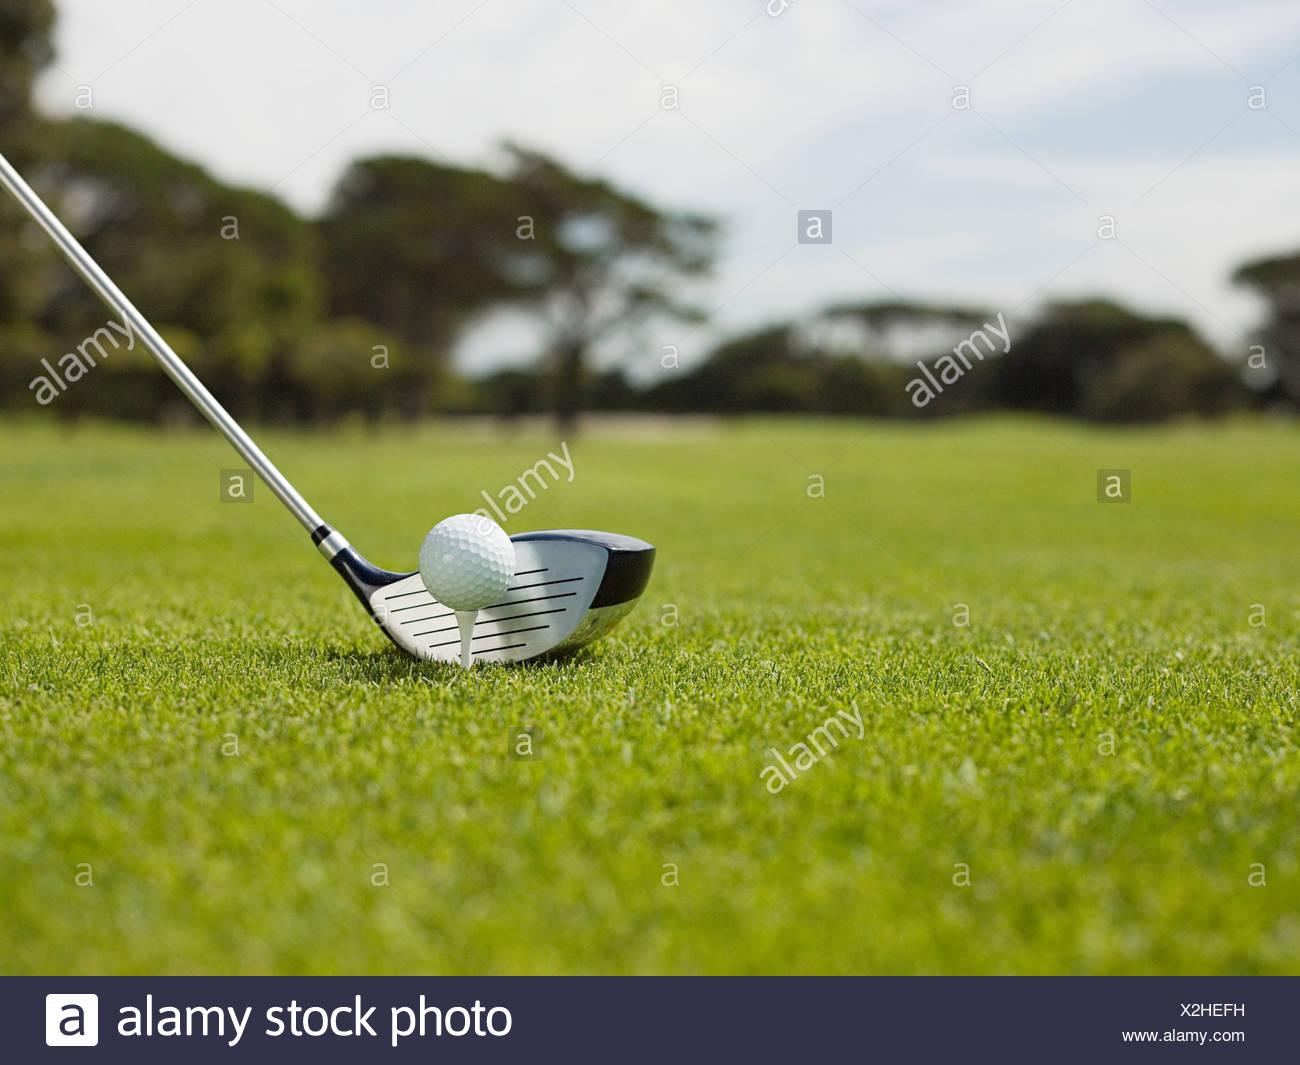 Golfball auf Golfplatz, Nahaufnahme Stockbild